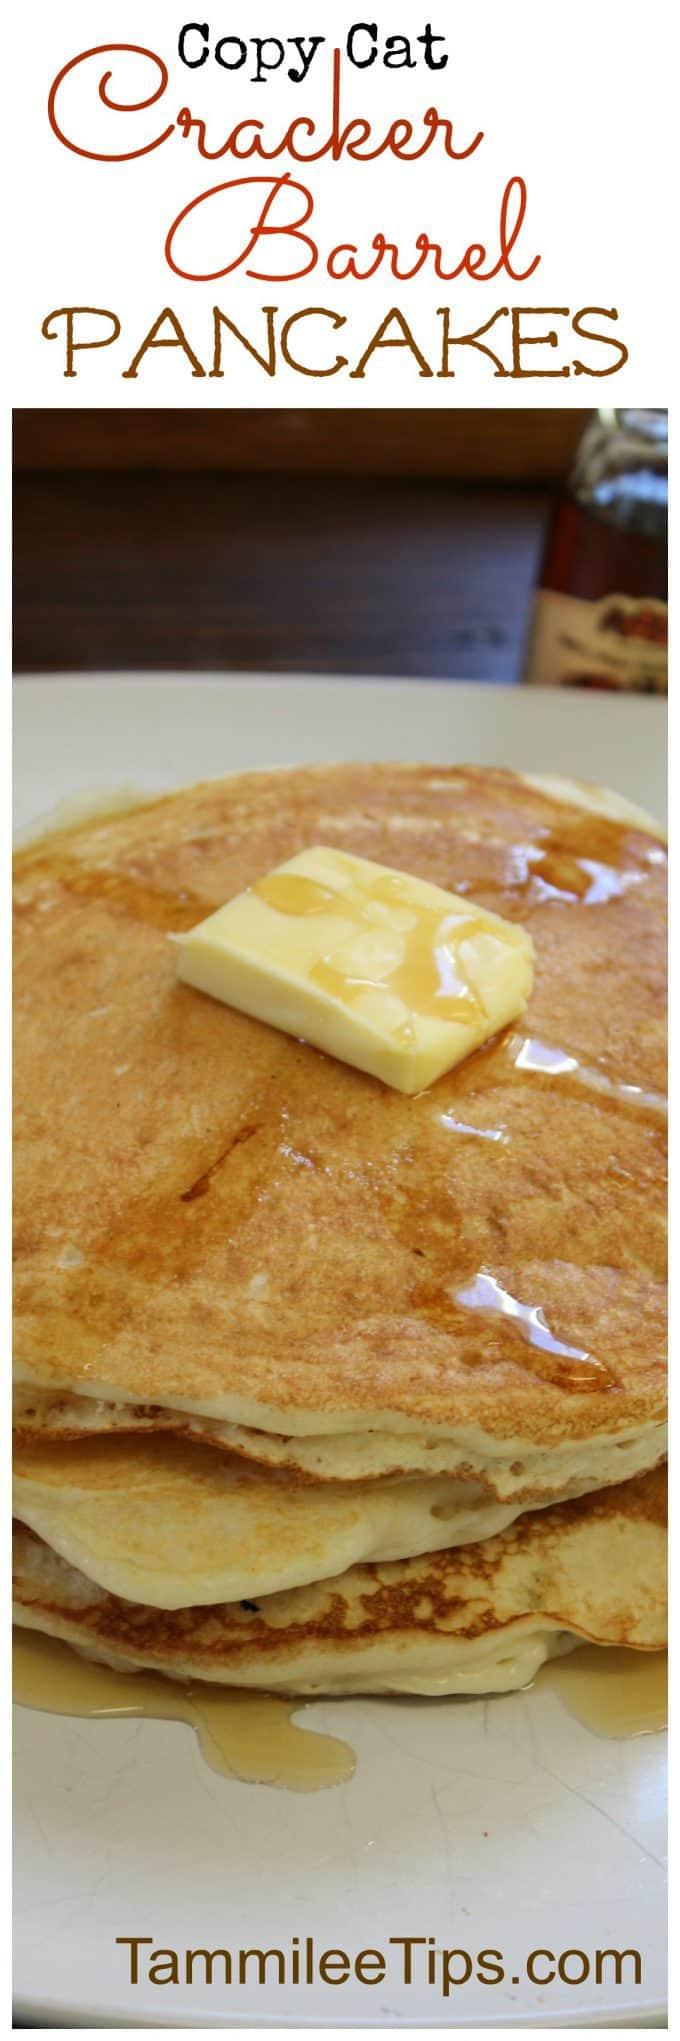 Copy Cat Cracker Barrel Pancakes